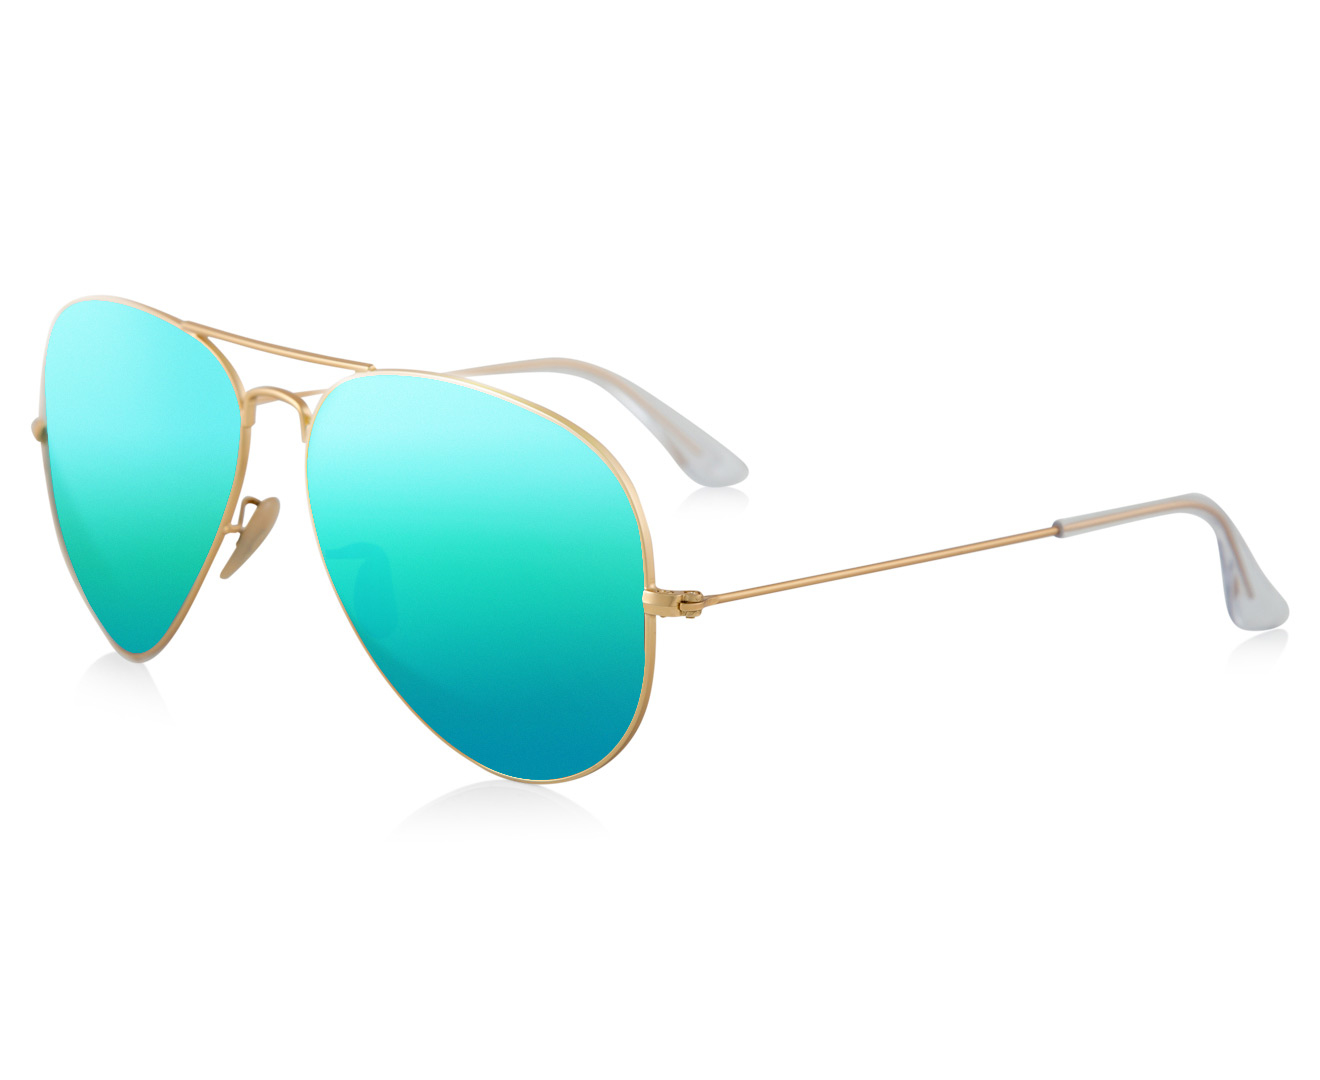 2986d57b93 Ray-Ban Aviator Flash RB3025-112 19 Sunglasses - Gold Green